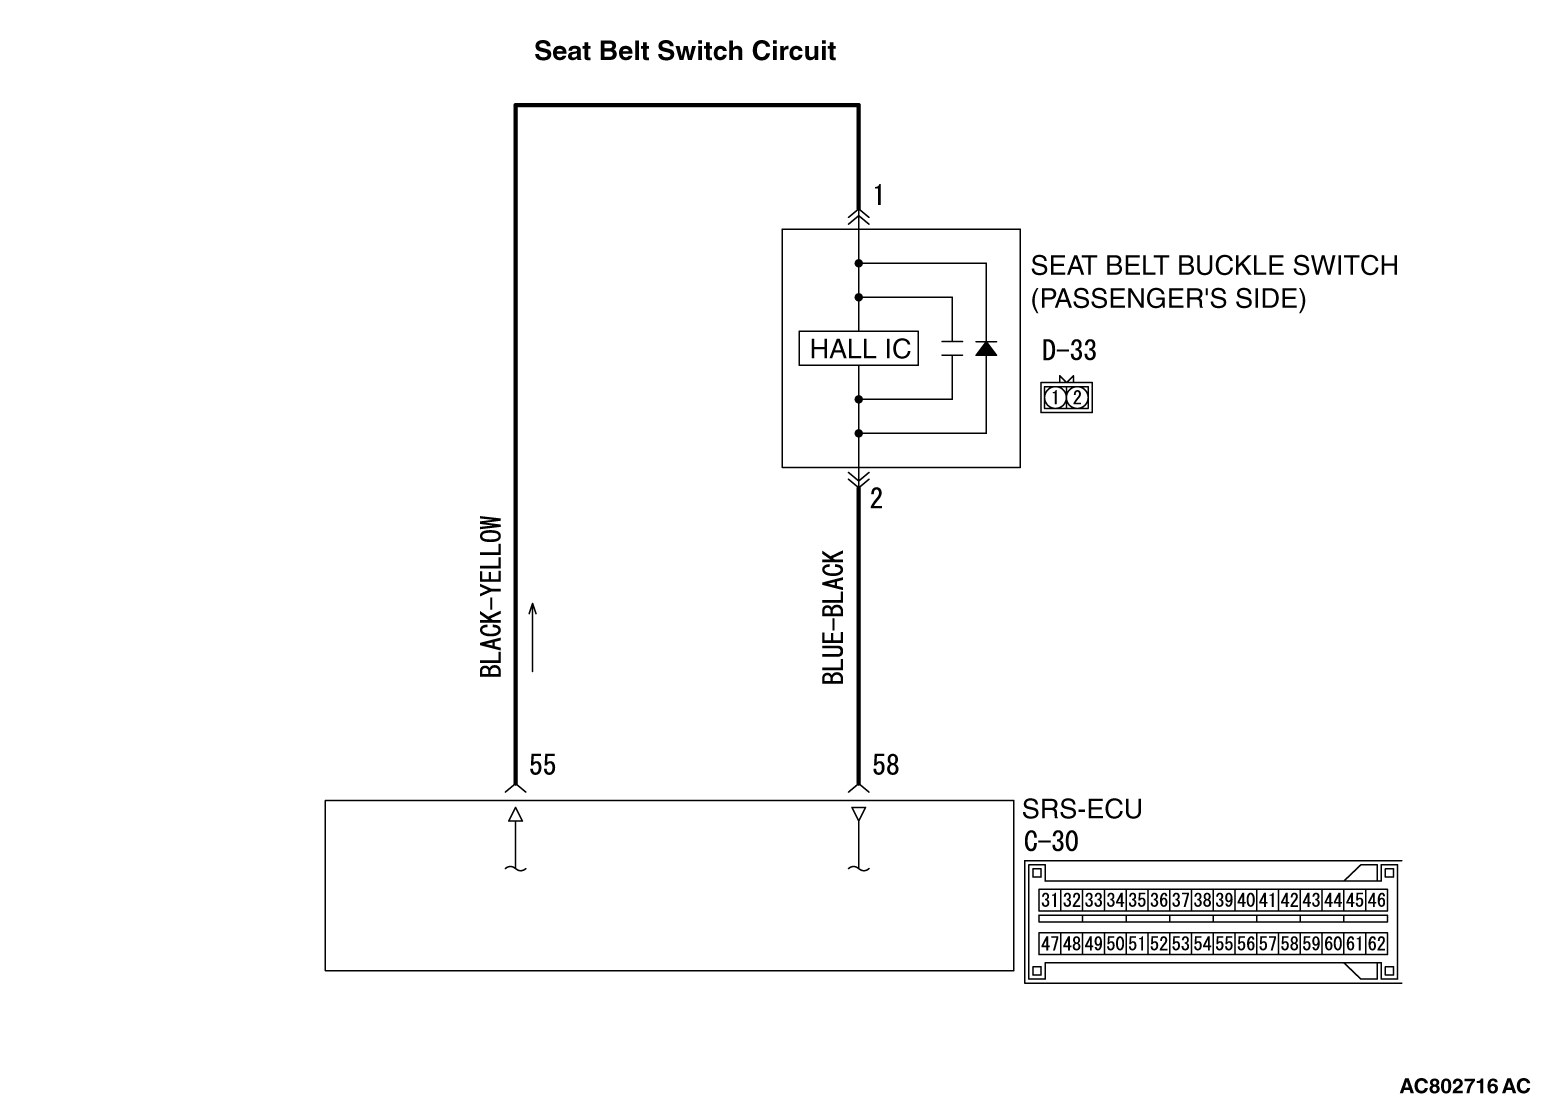 52b Dtc B1b54 Seat Belt Switch Rh Malfunction Wiring Open Circuit B1b55 Buckle Power Supply Side Shorted B1b56